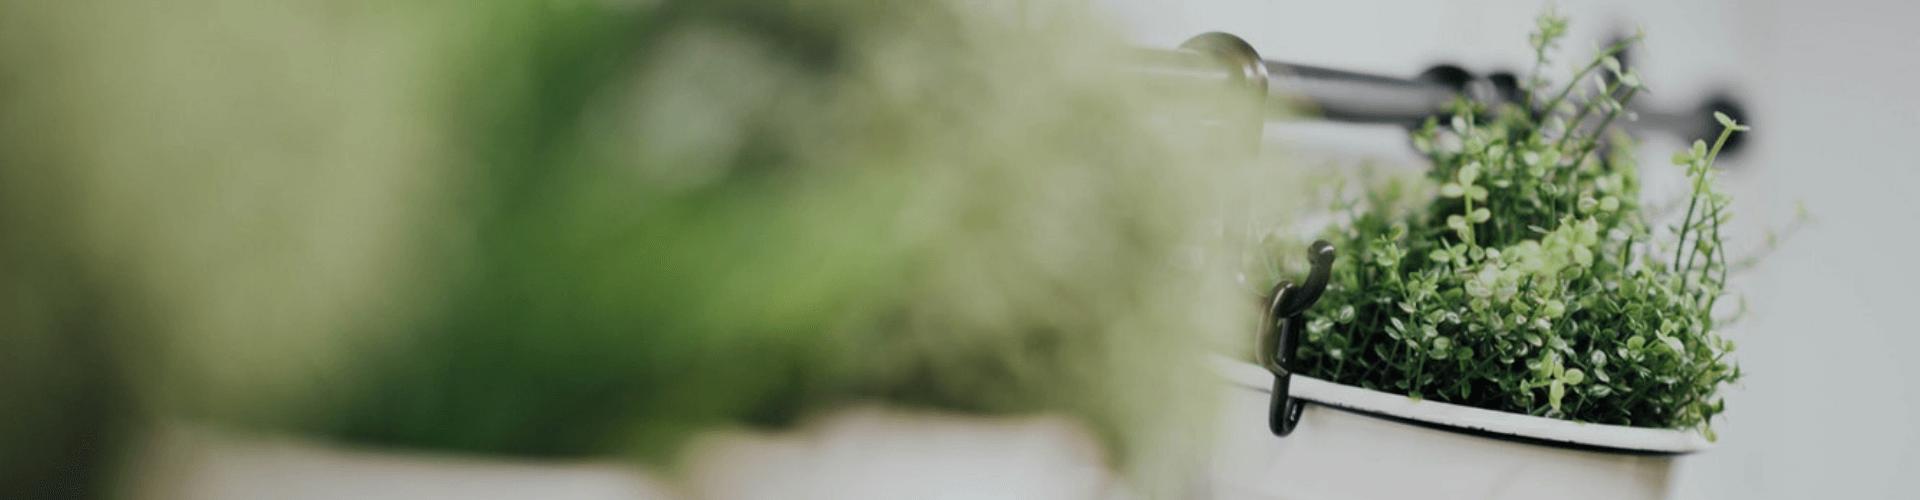 reasons your herb garden failed